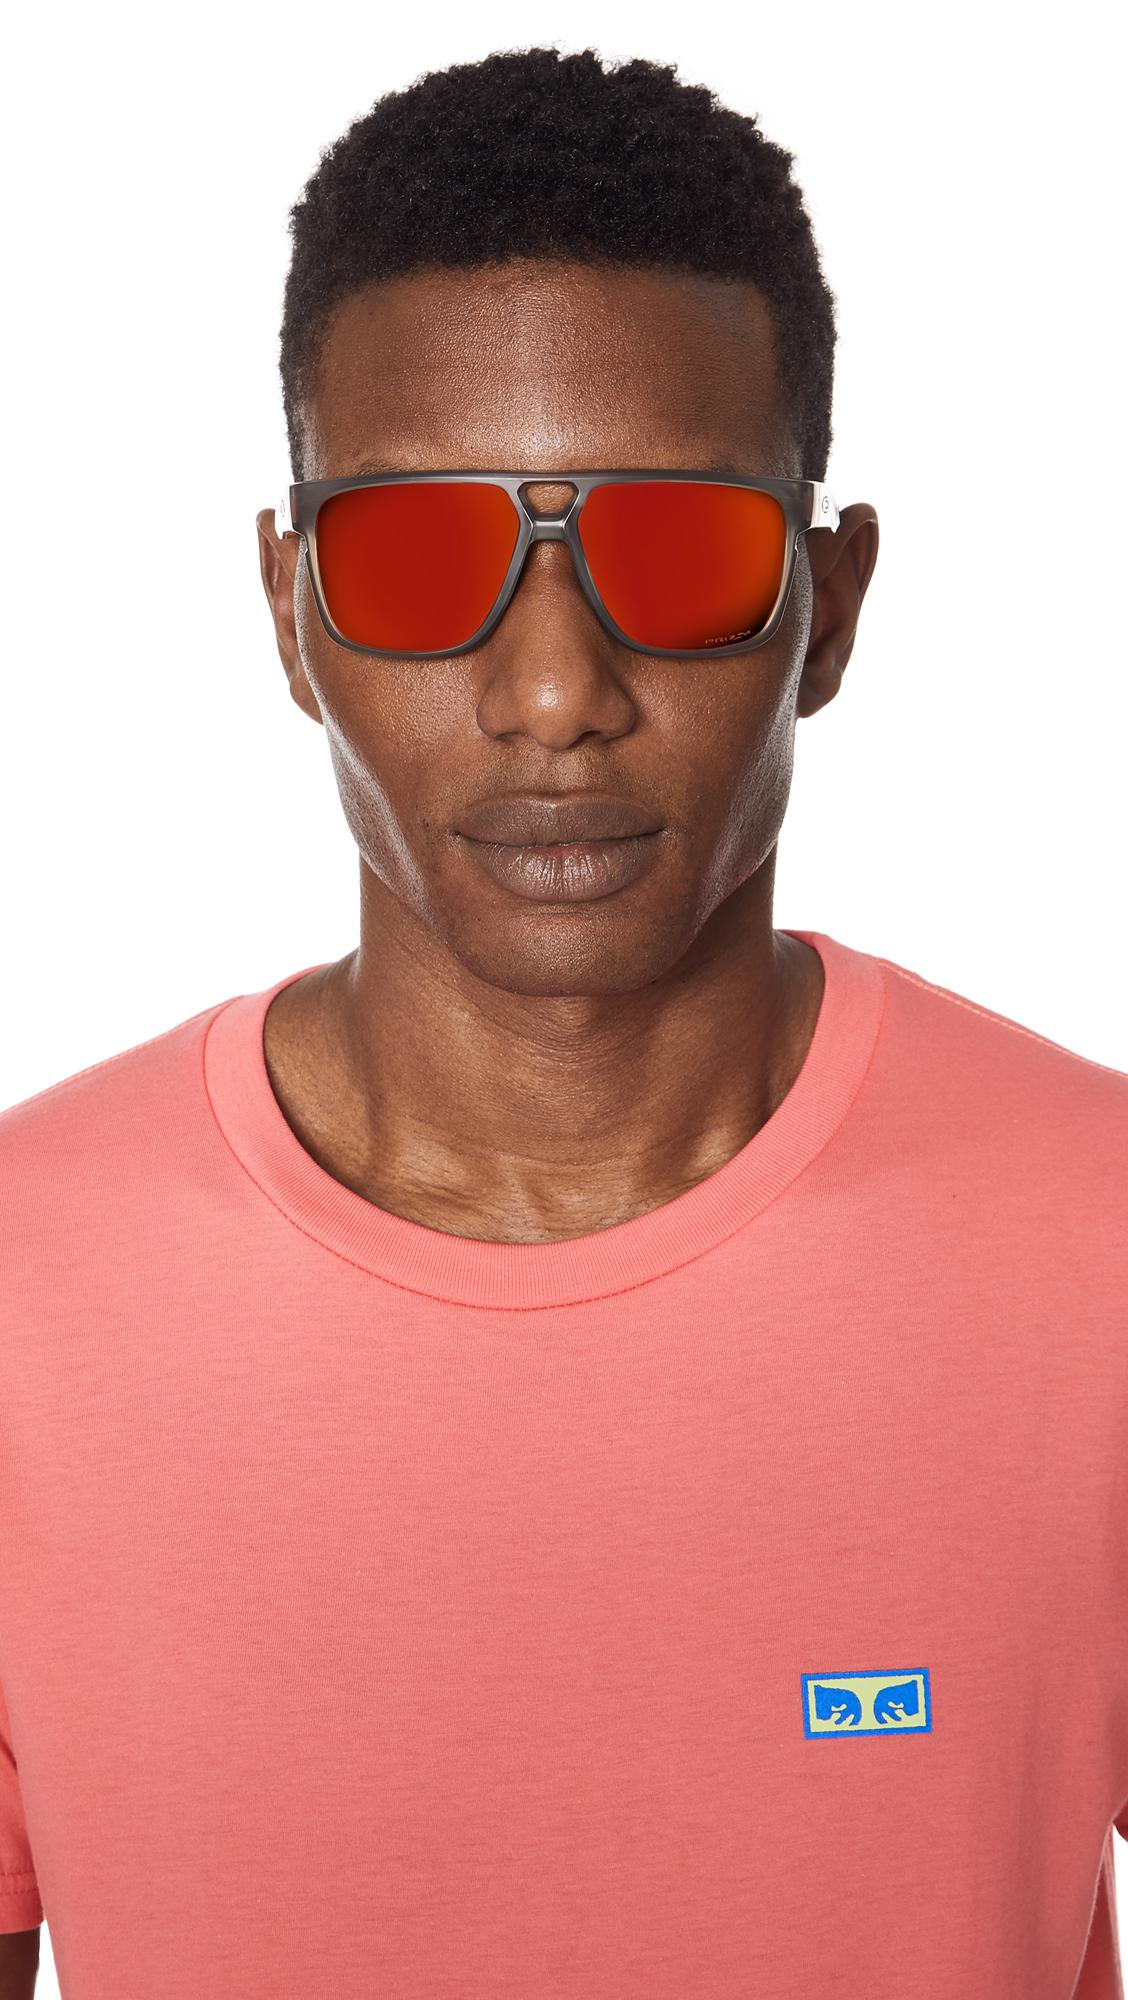 82e3b5ffe56 Oakley - Multicolor Crossrange Patch Prizm Sunglasses for Men - Lyst. View  fullscreen